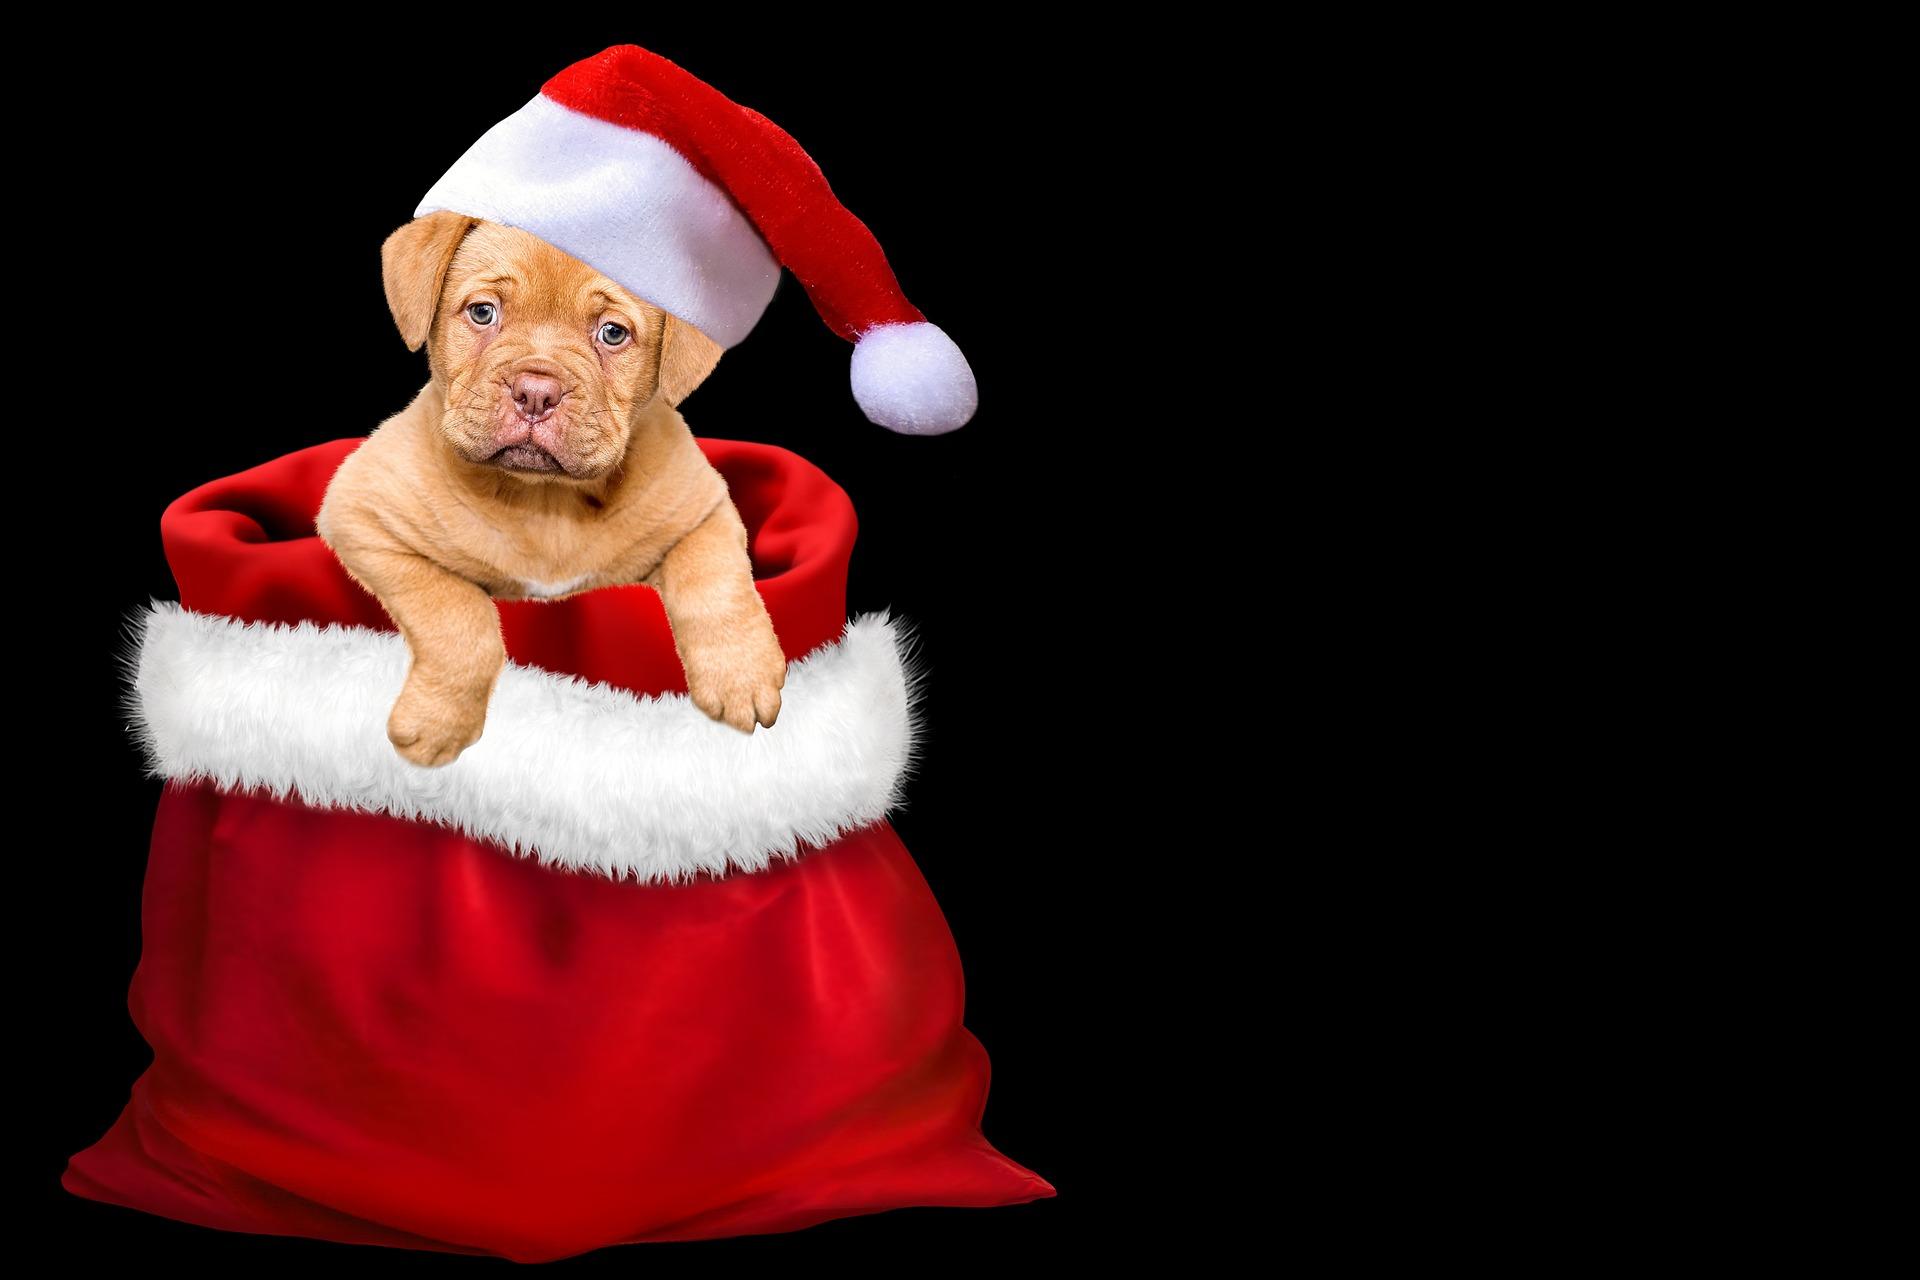 christmas-3001320_1920.jpg